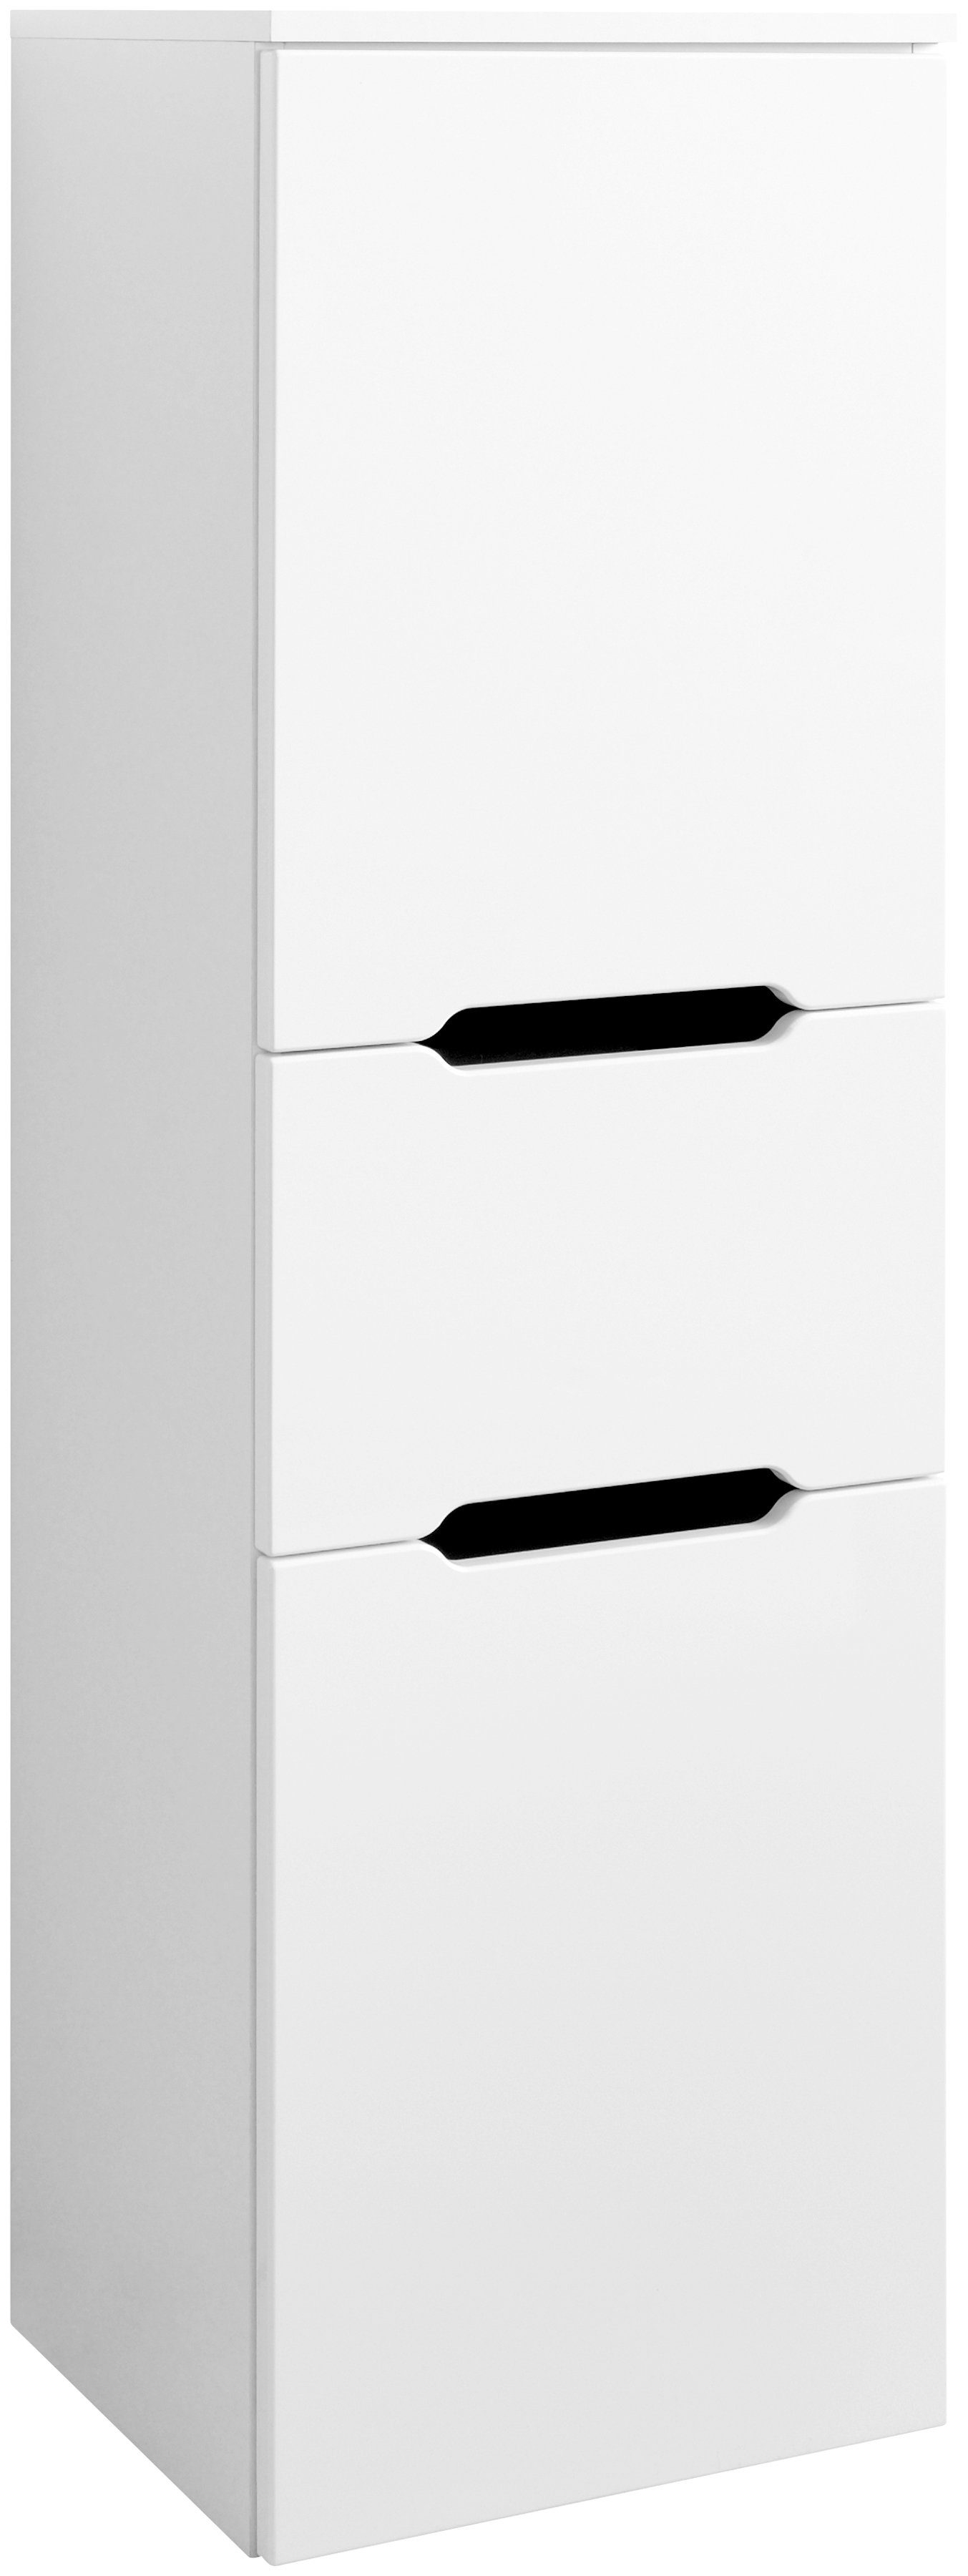 Midischrank »Belluno«, Breite 40 cm